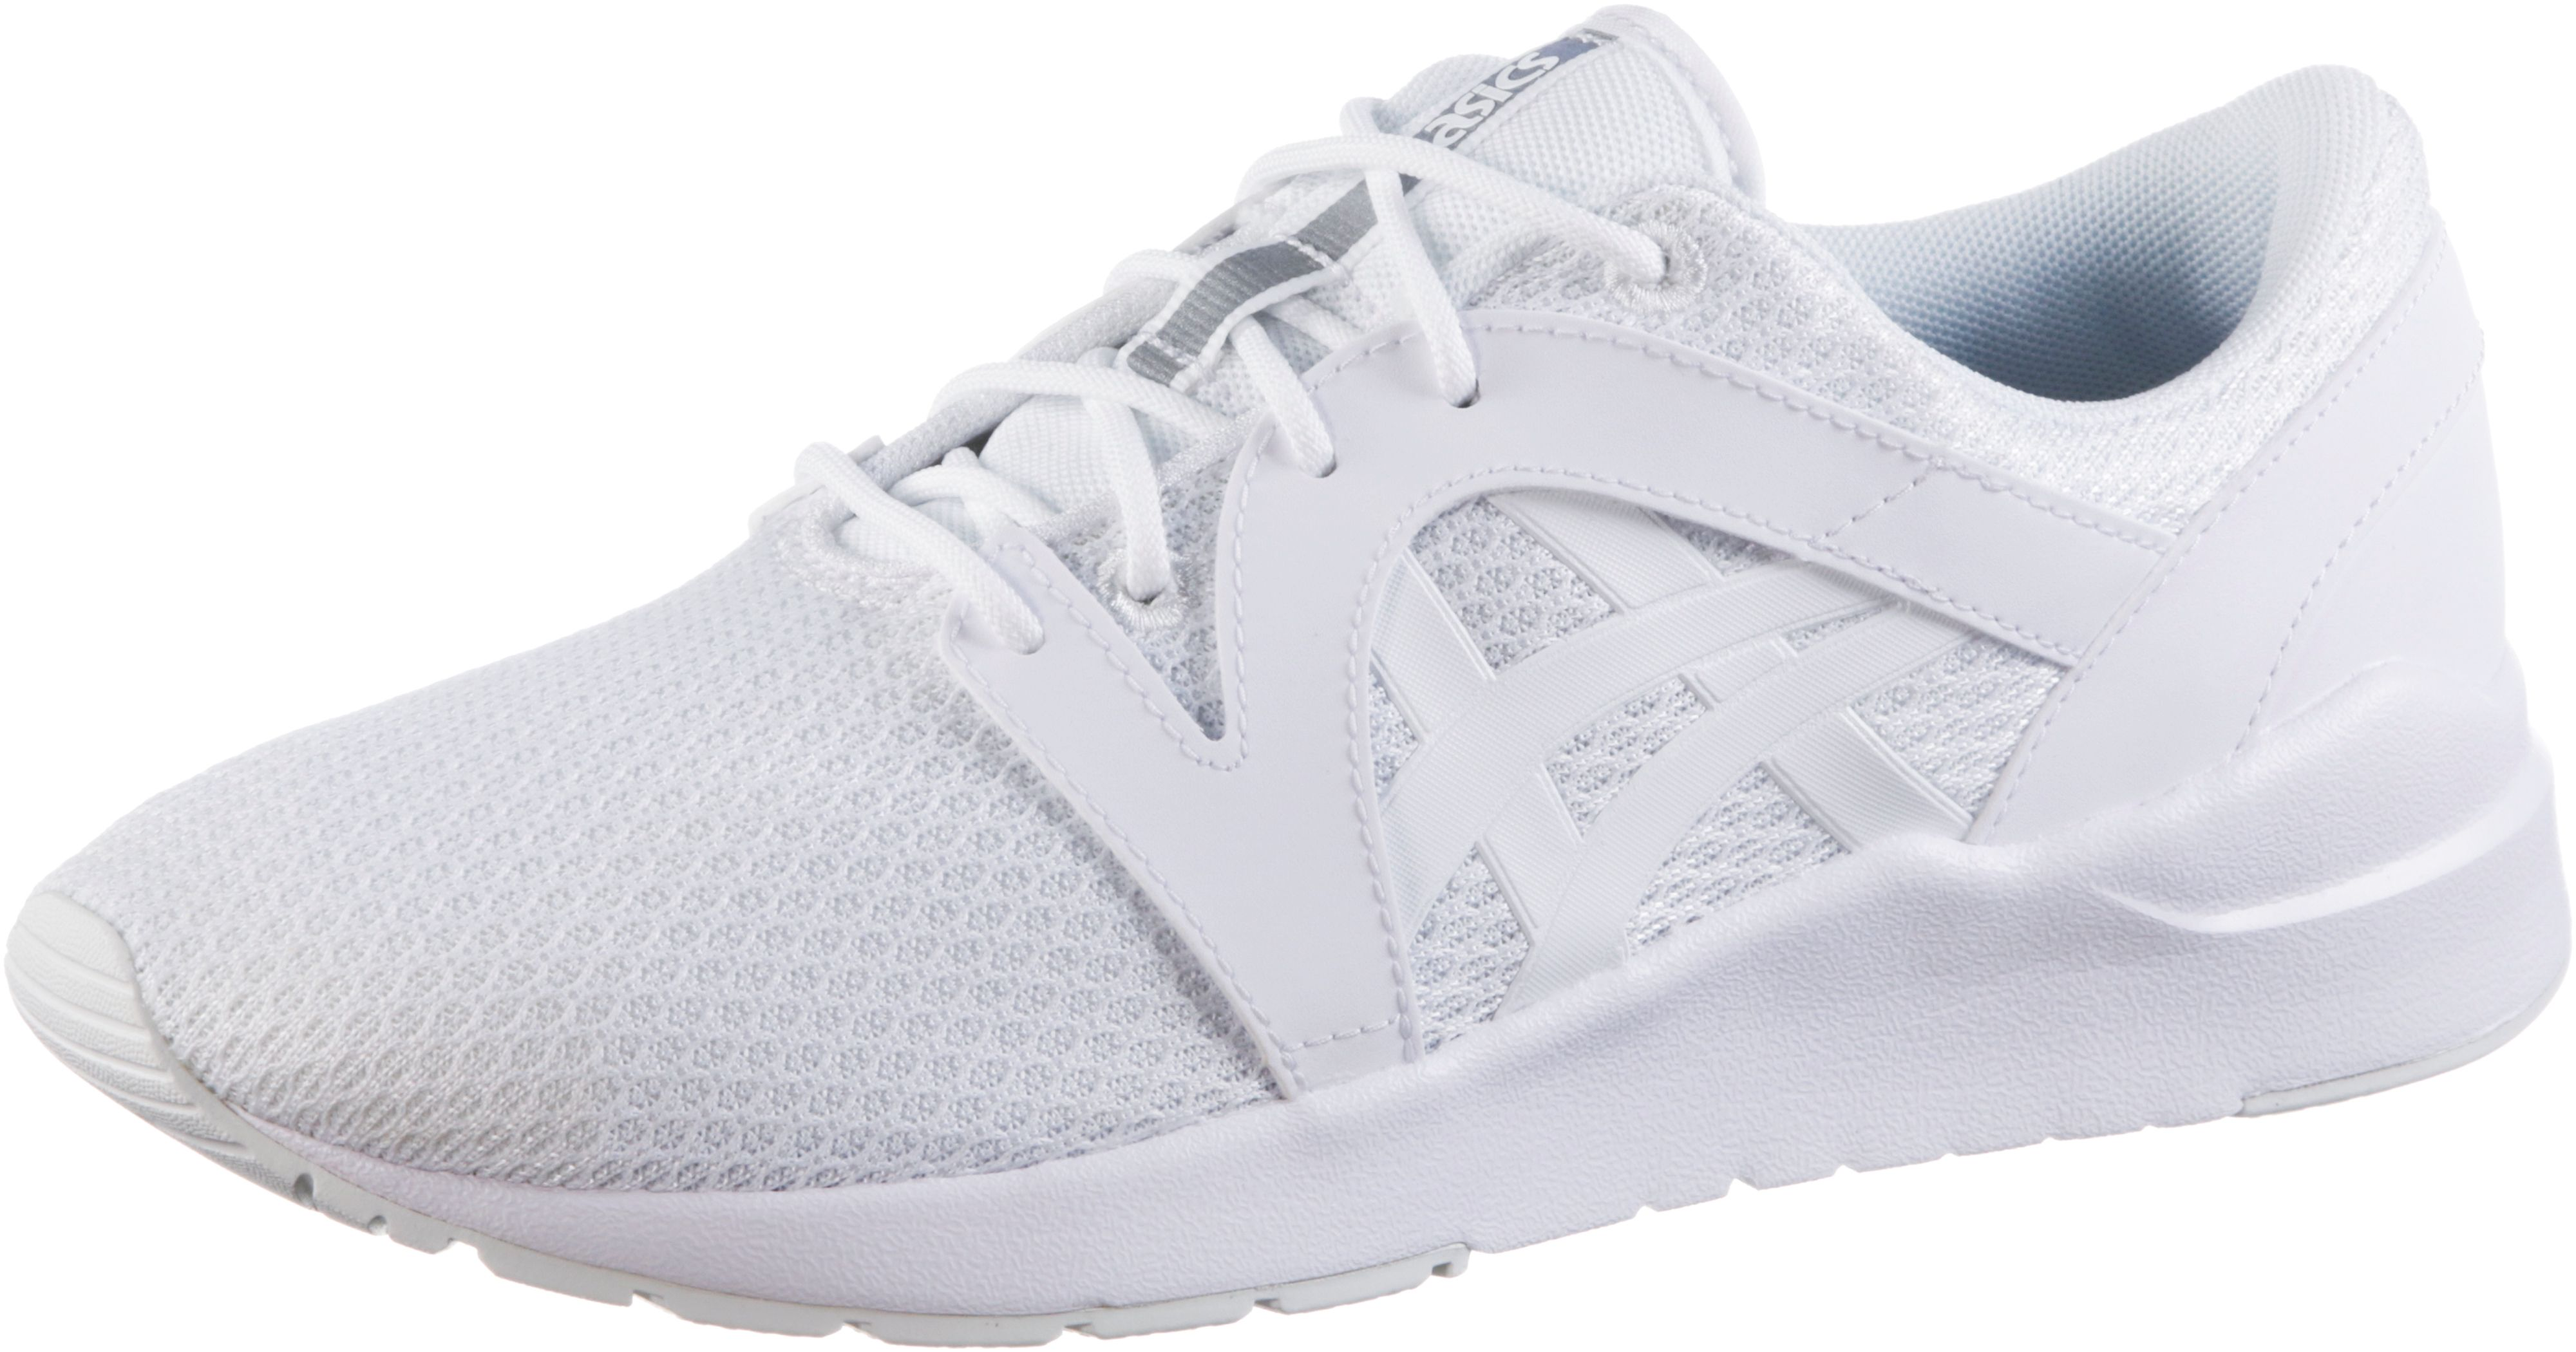 ASICS Gel Lyte Komachi Sneaker Damen, blackblack,Größen: 36, 37, 37 1/2, 38, 39 1/2, 39, 40, 40 1/2, 41 1/2, 42